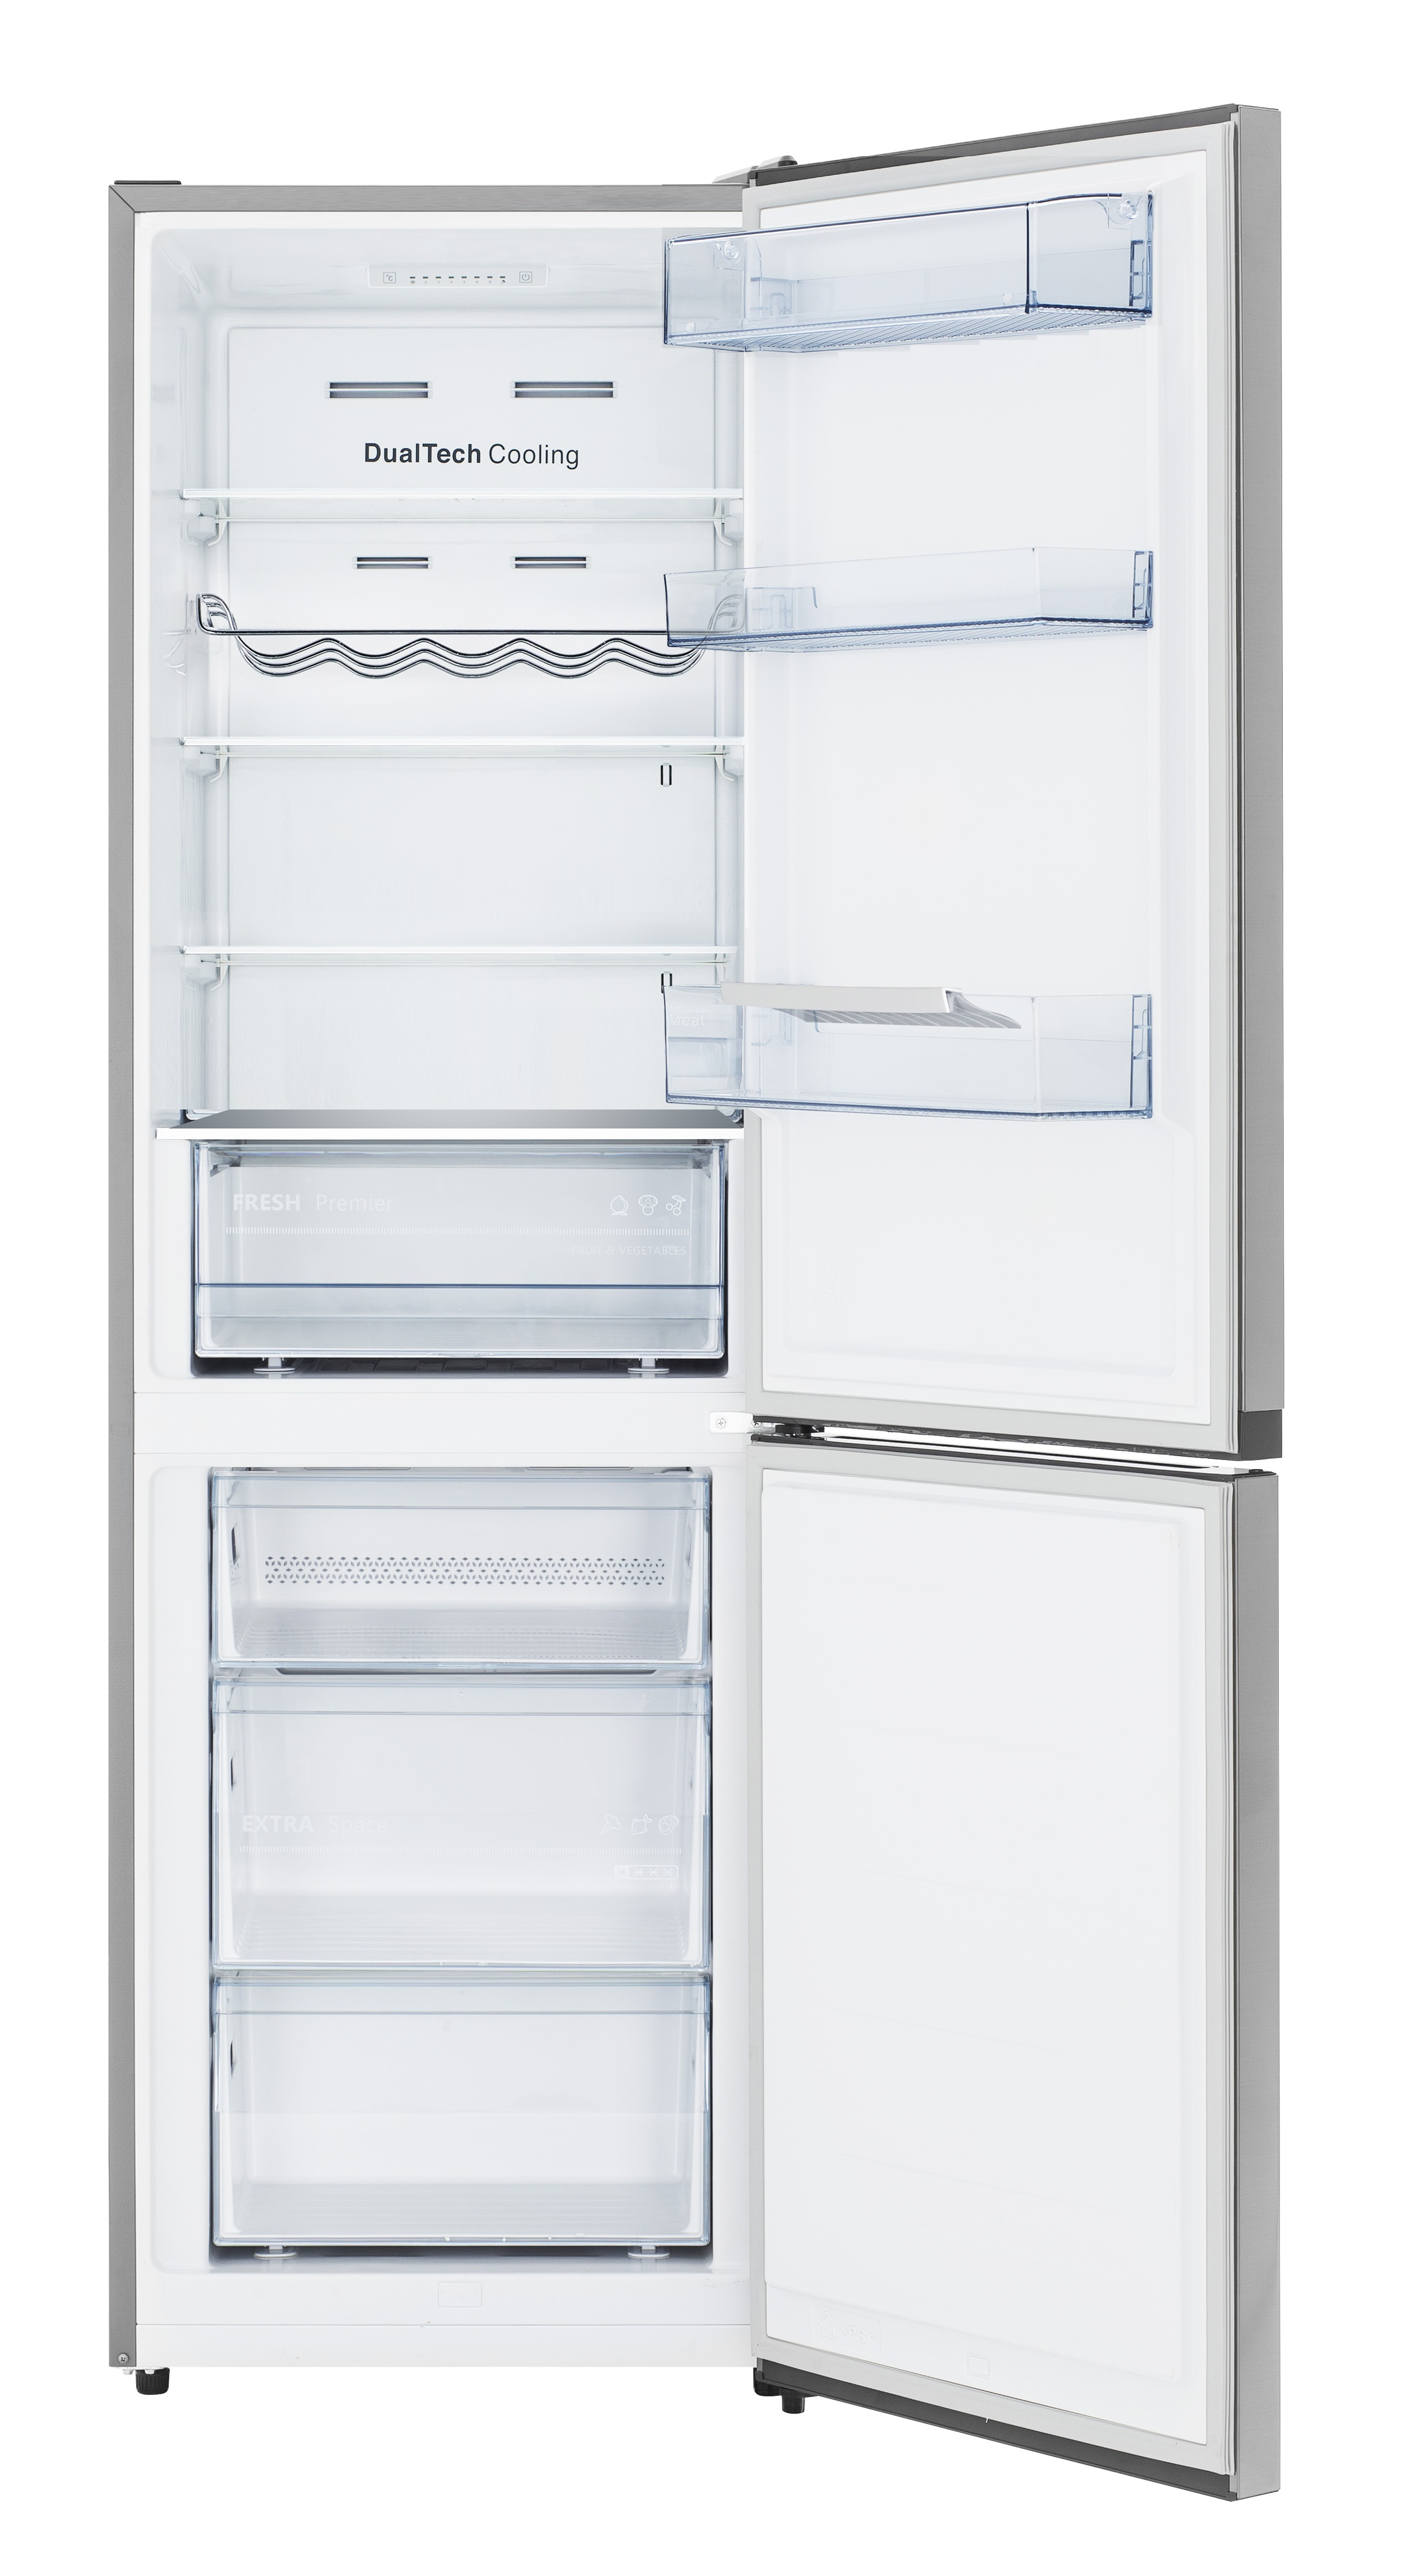 MDRF375WE-N Tall Bottom Mount Refrigerator